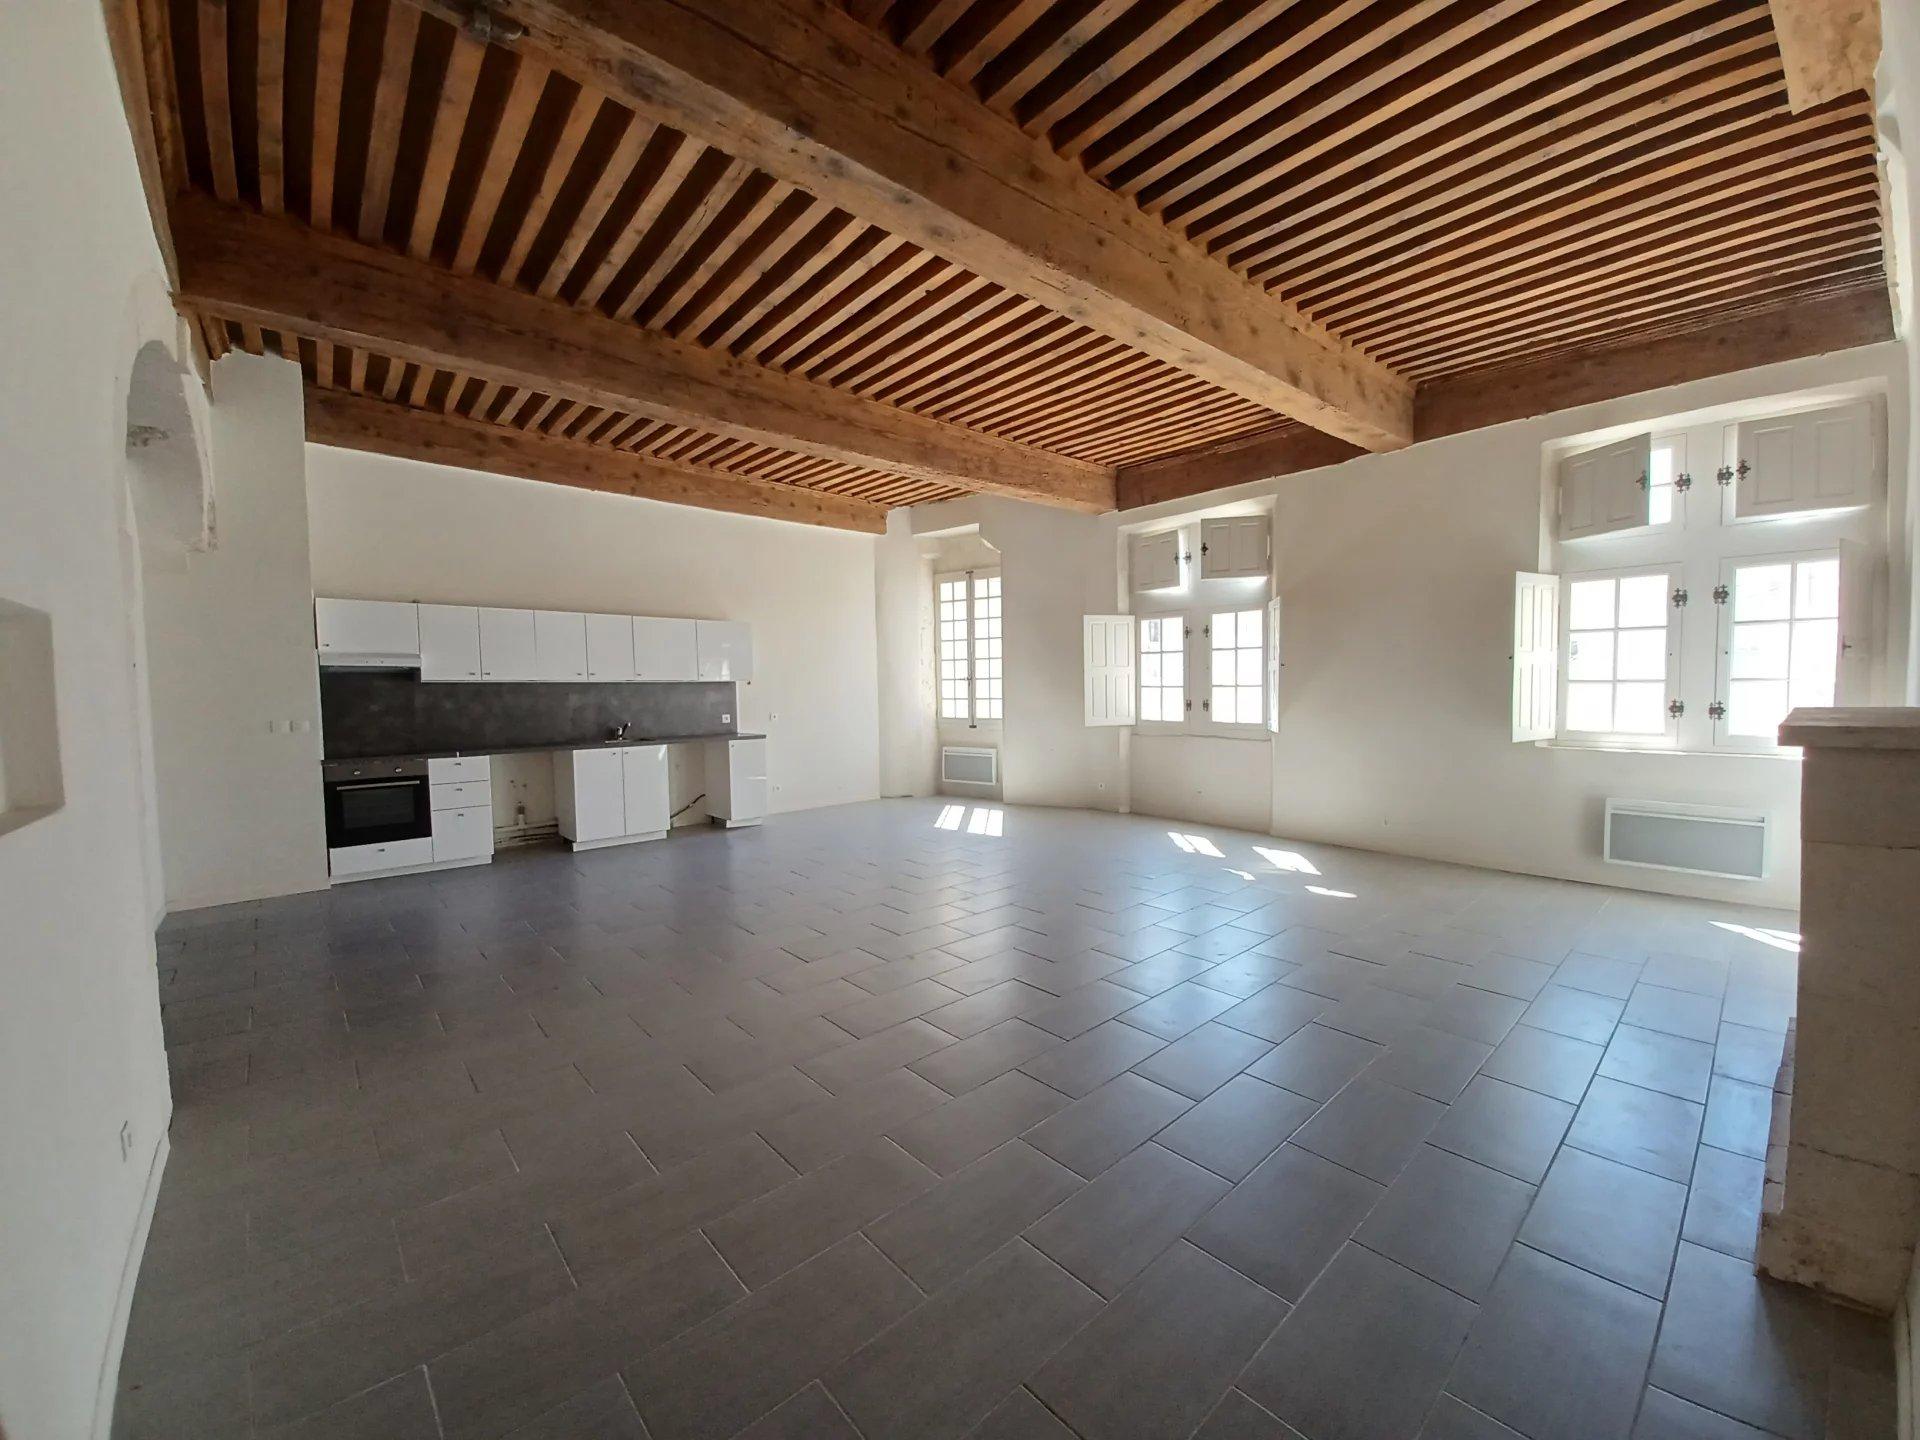 Location Appartement BEAUCAIRE Mandat : 0930